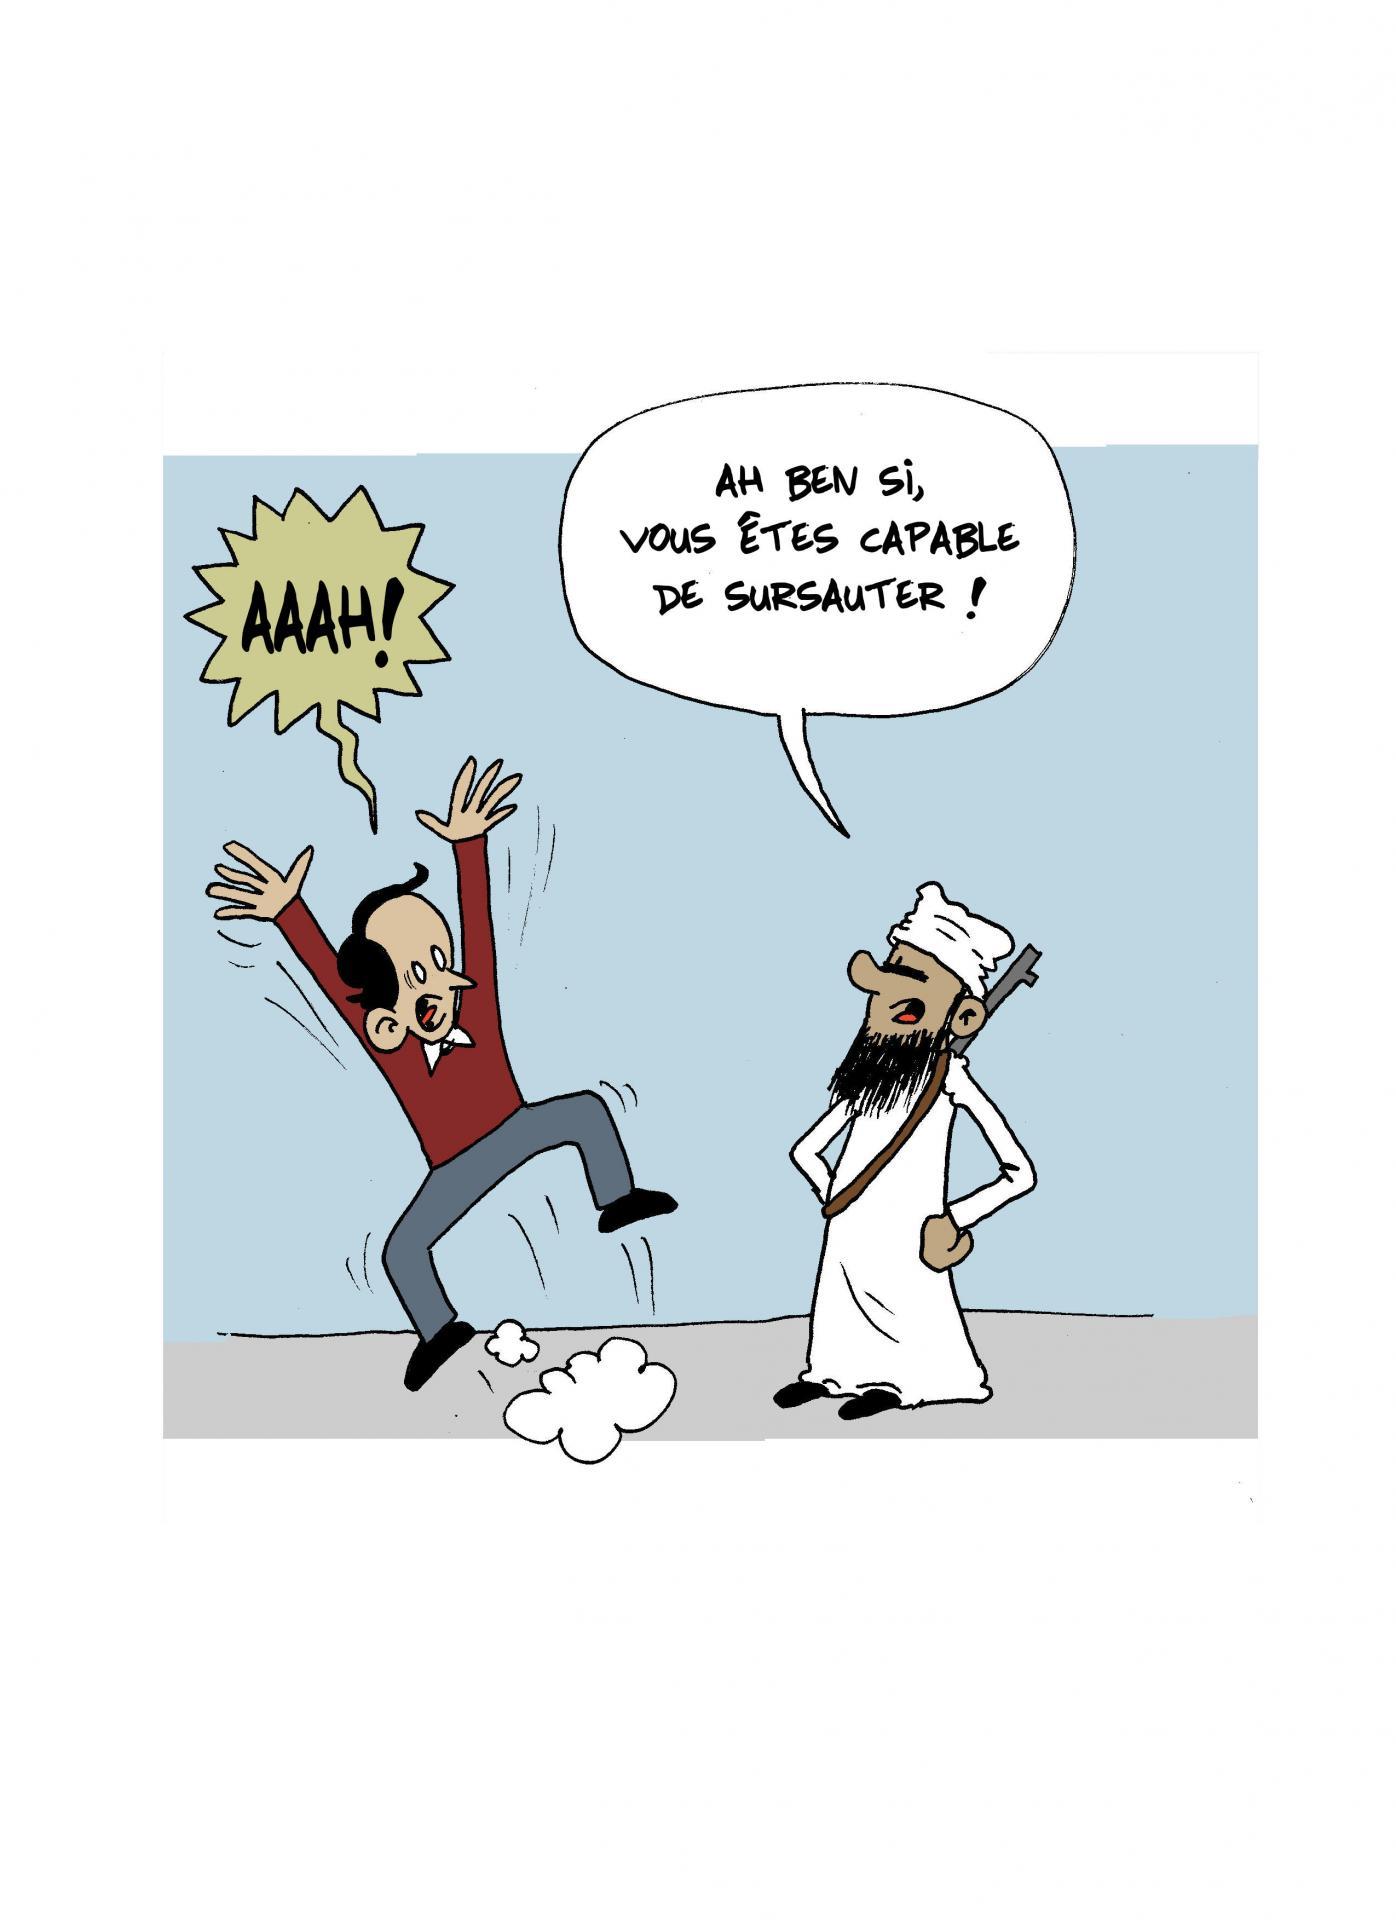 Lz page djihadiste